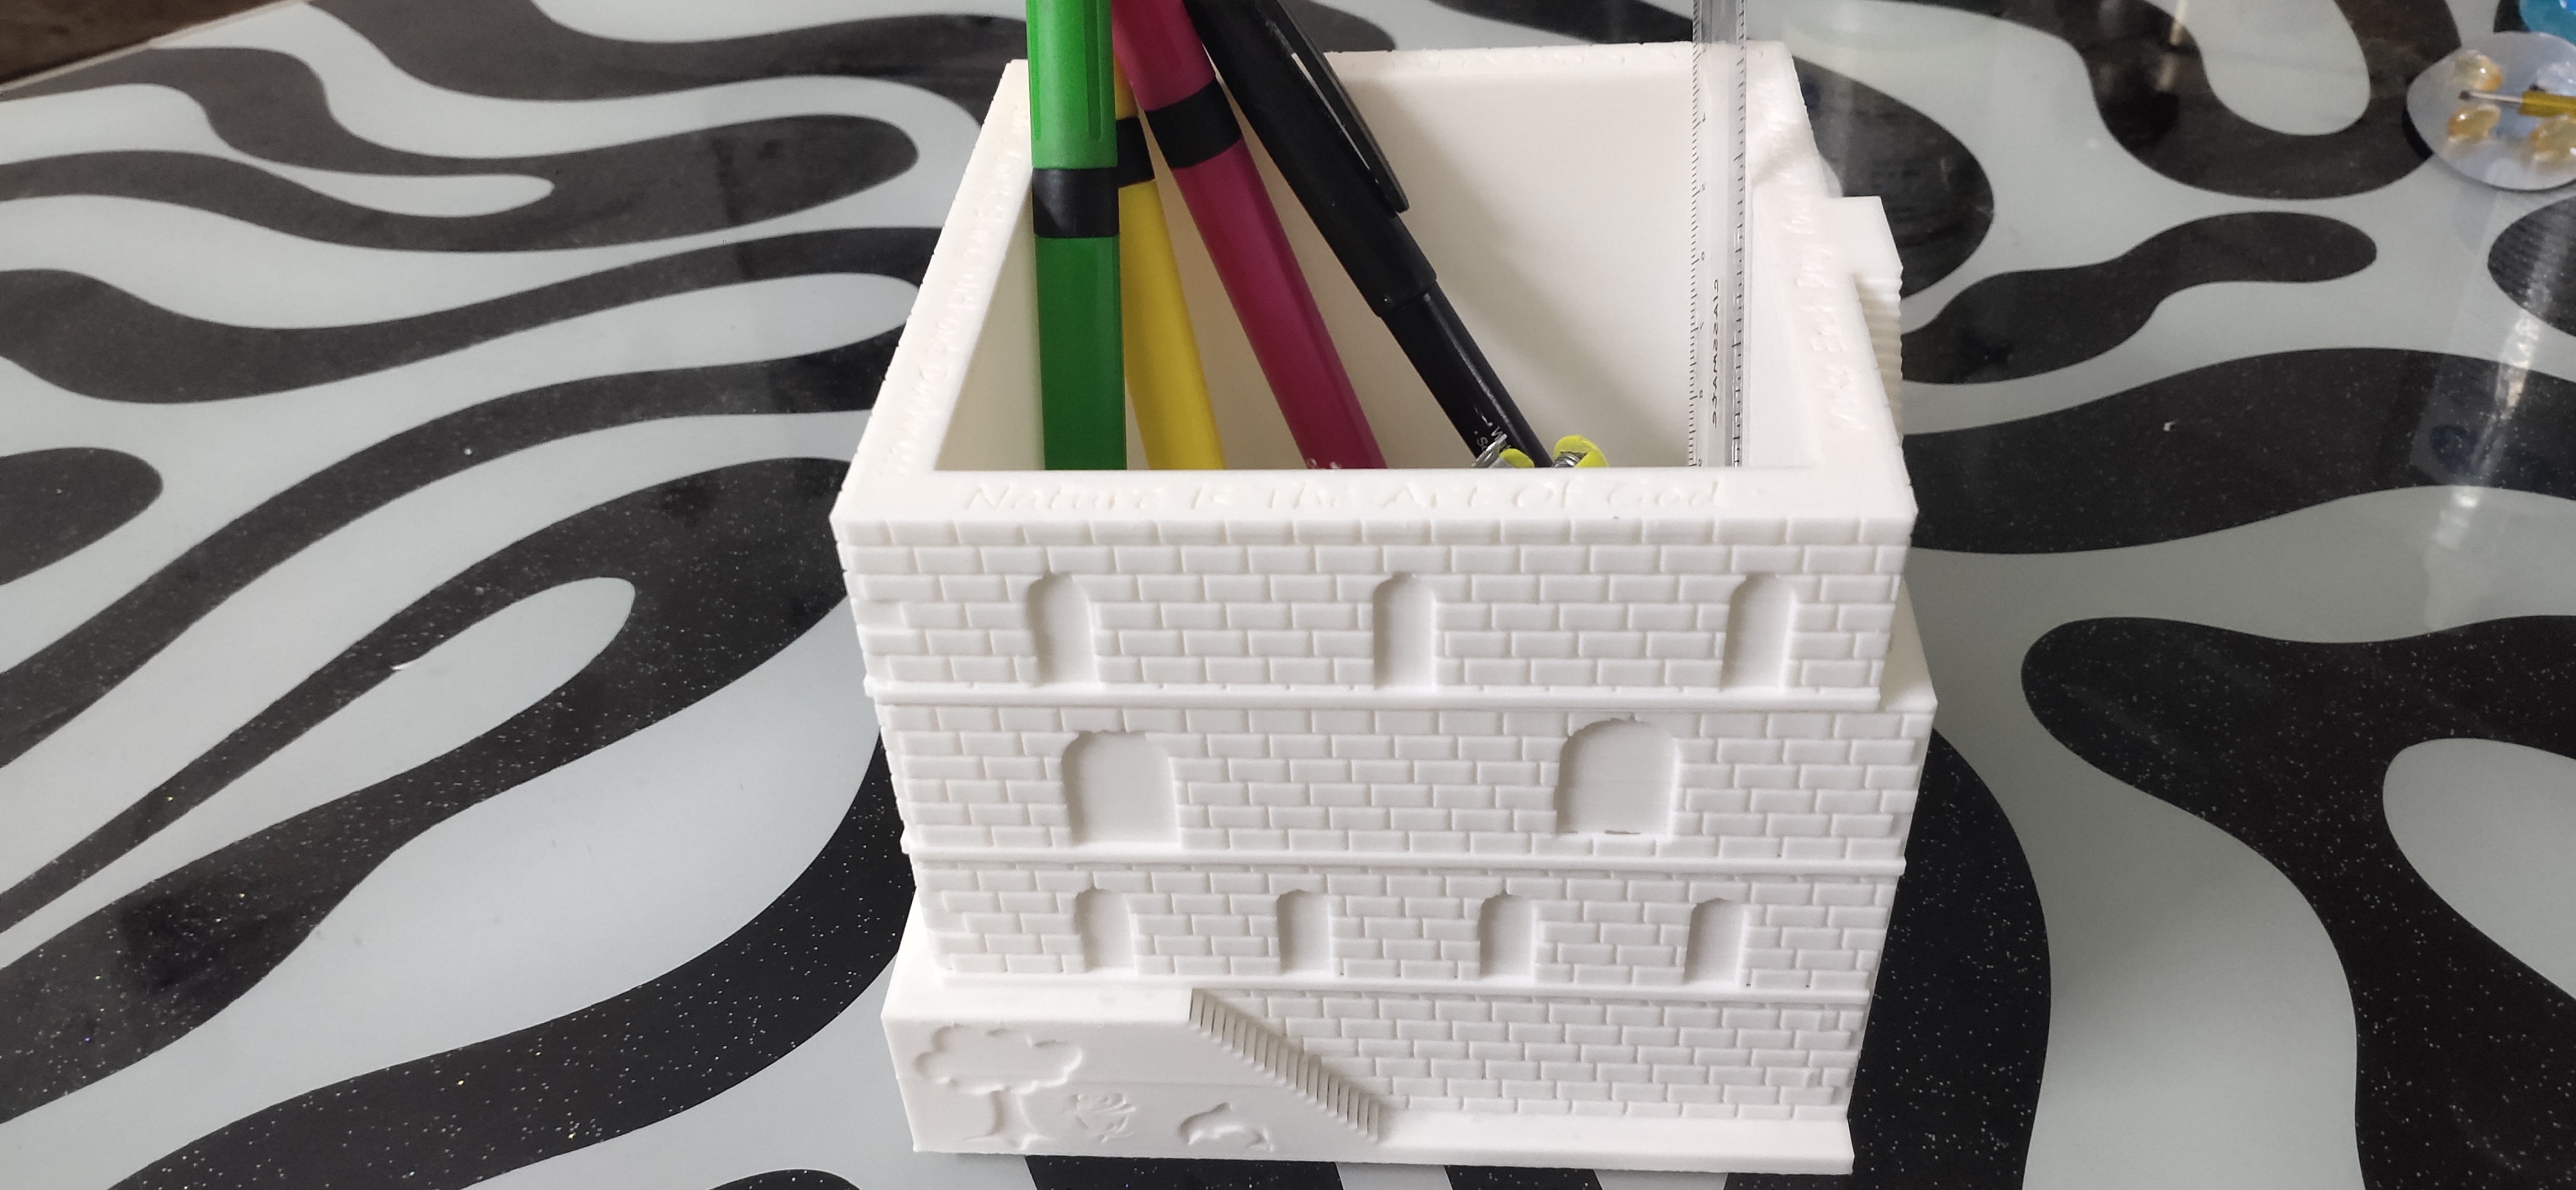 IMG_20200928_160216.jpg Download STL file Plant and desk pot • 3D printer object, FutureDesigns